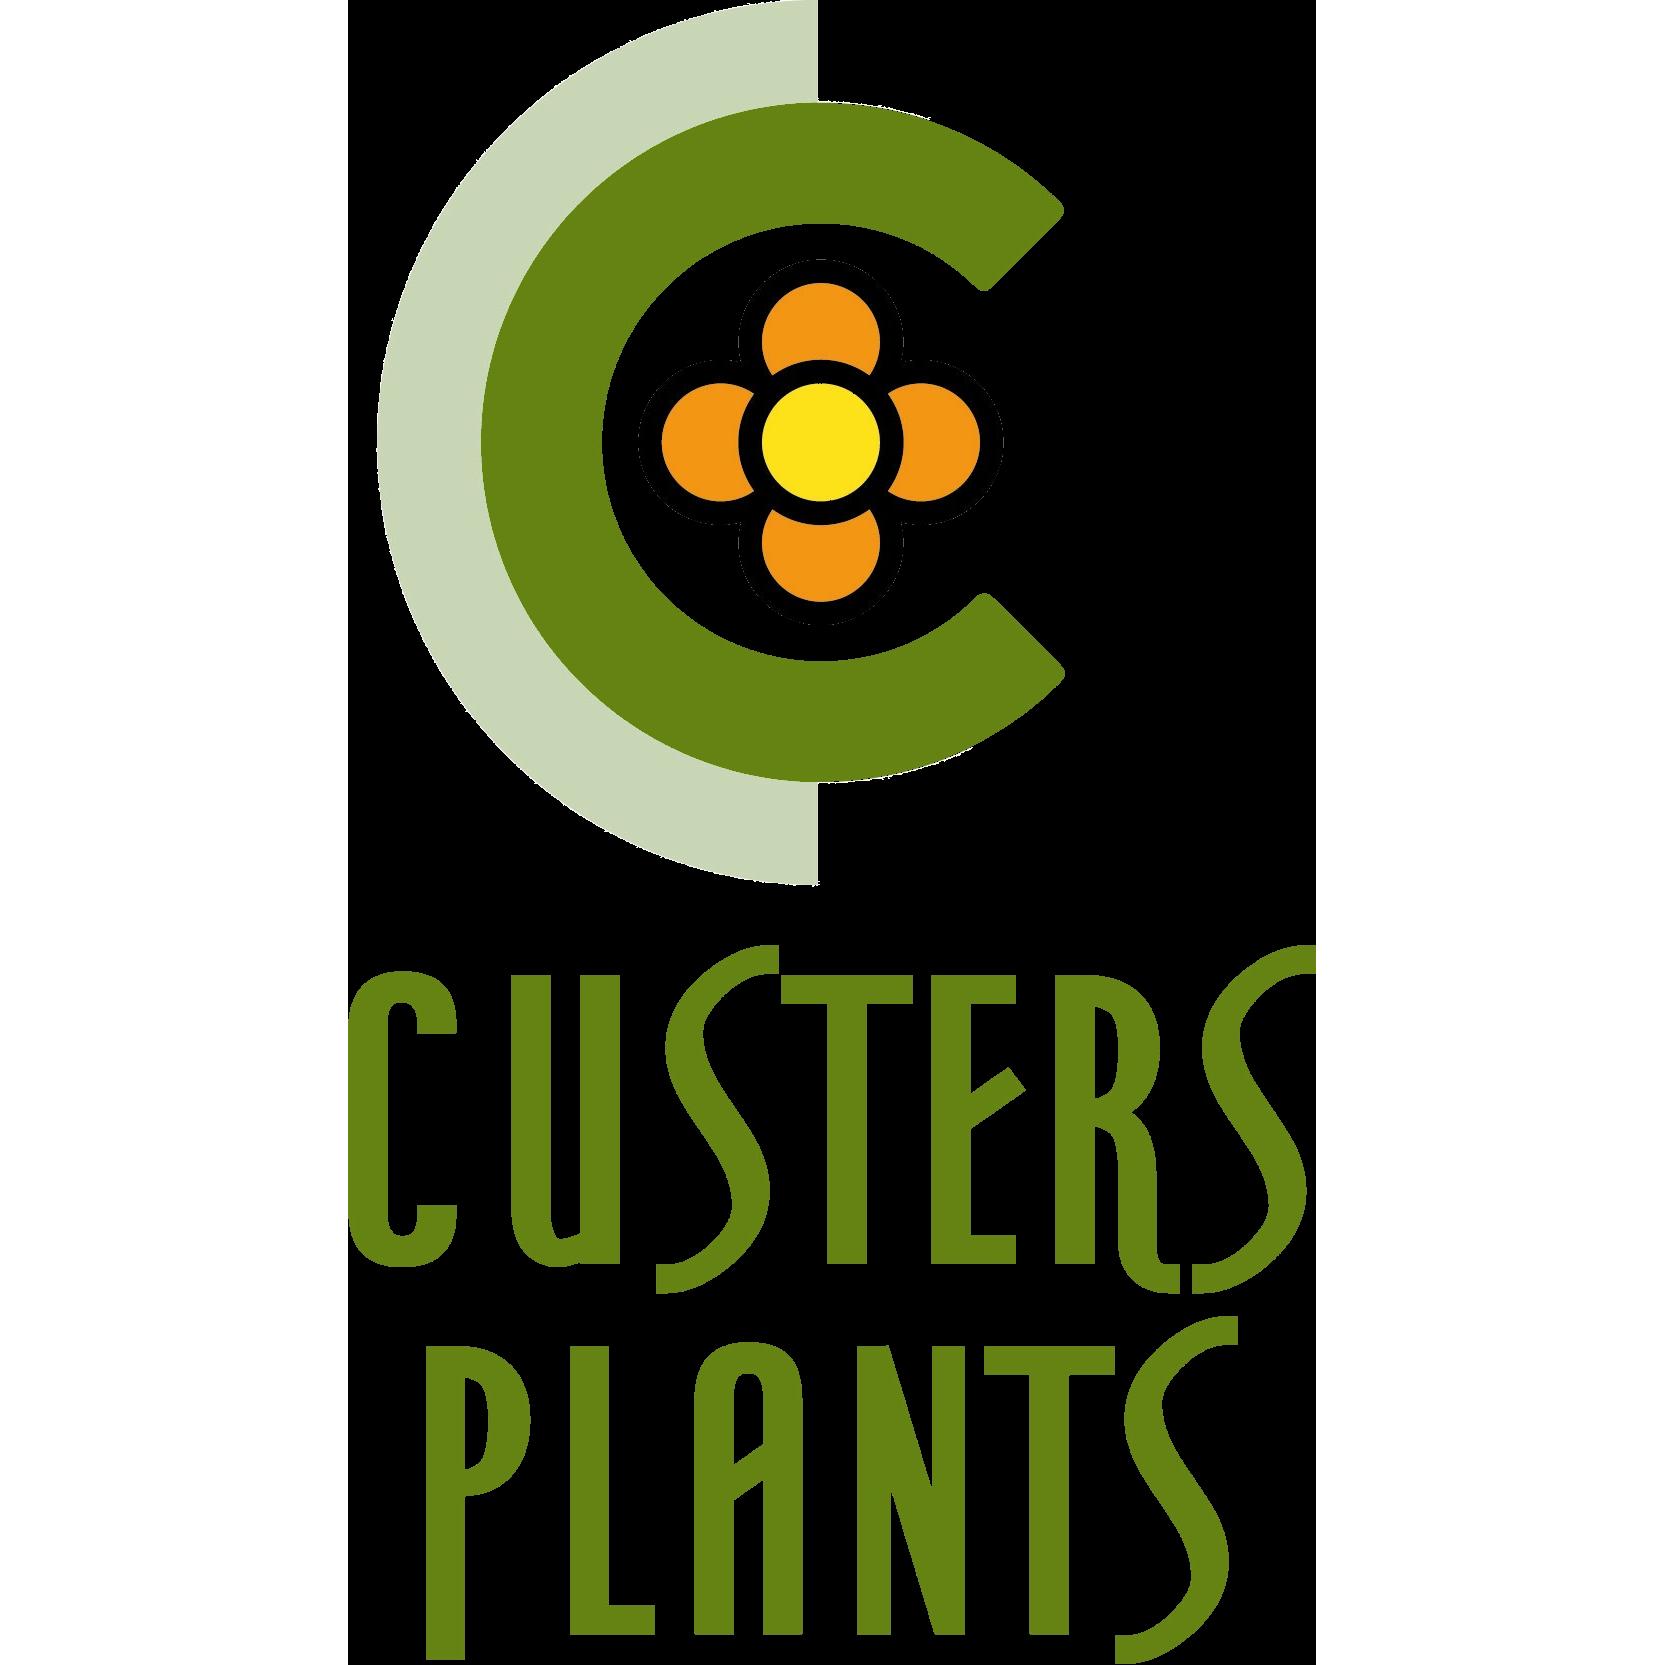 Custers Plants